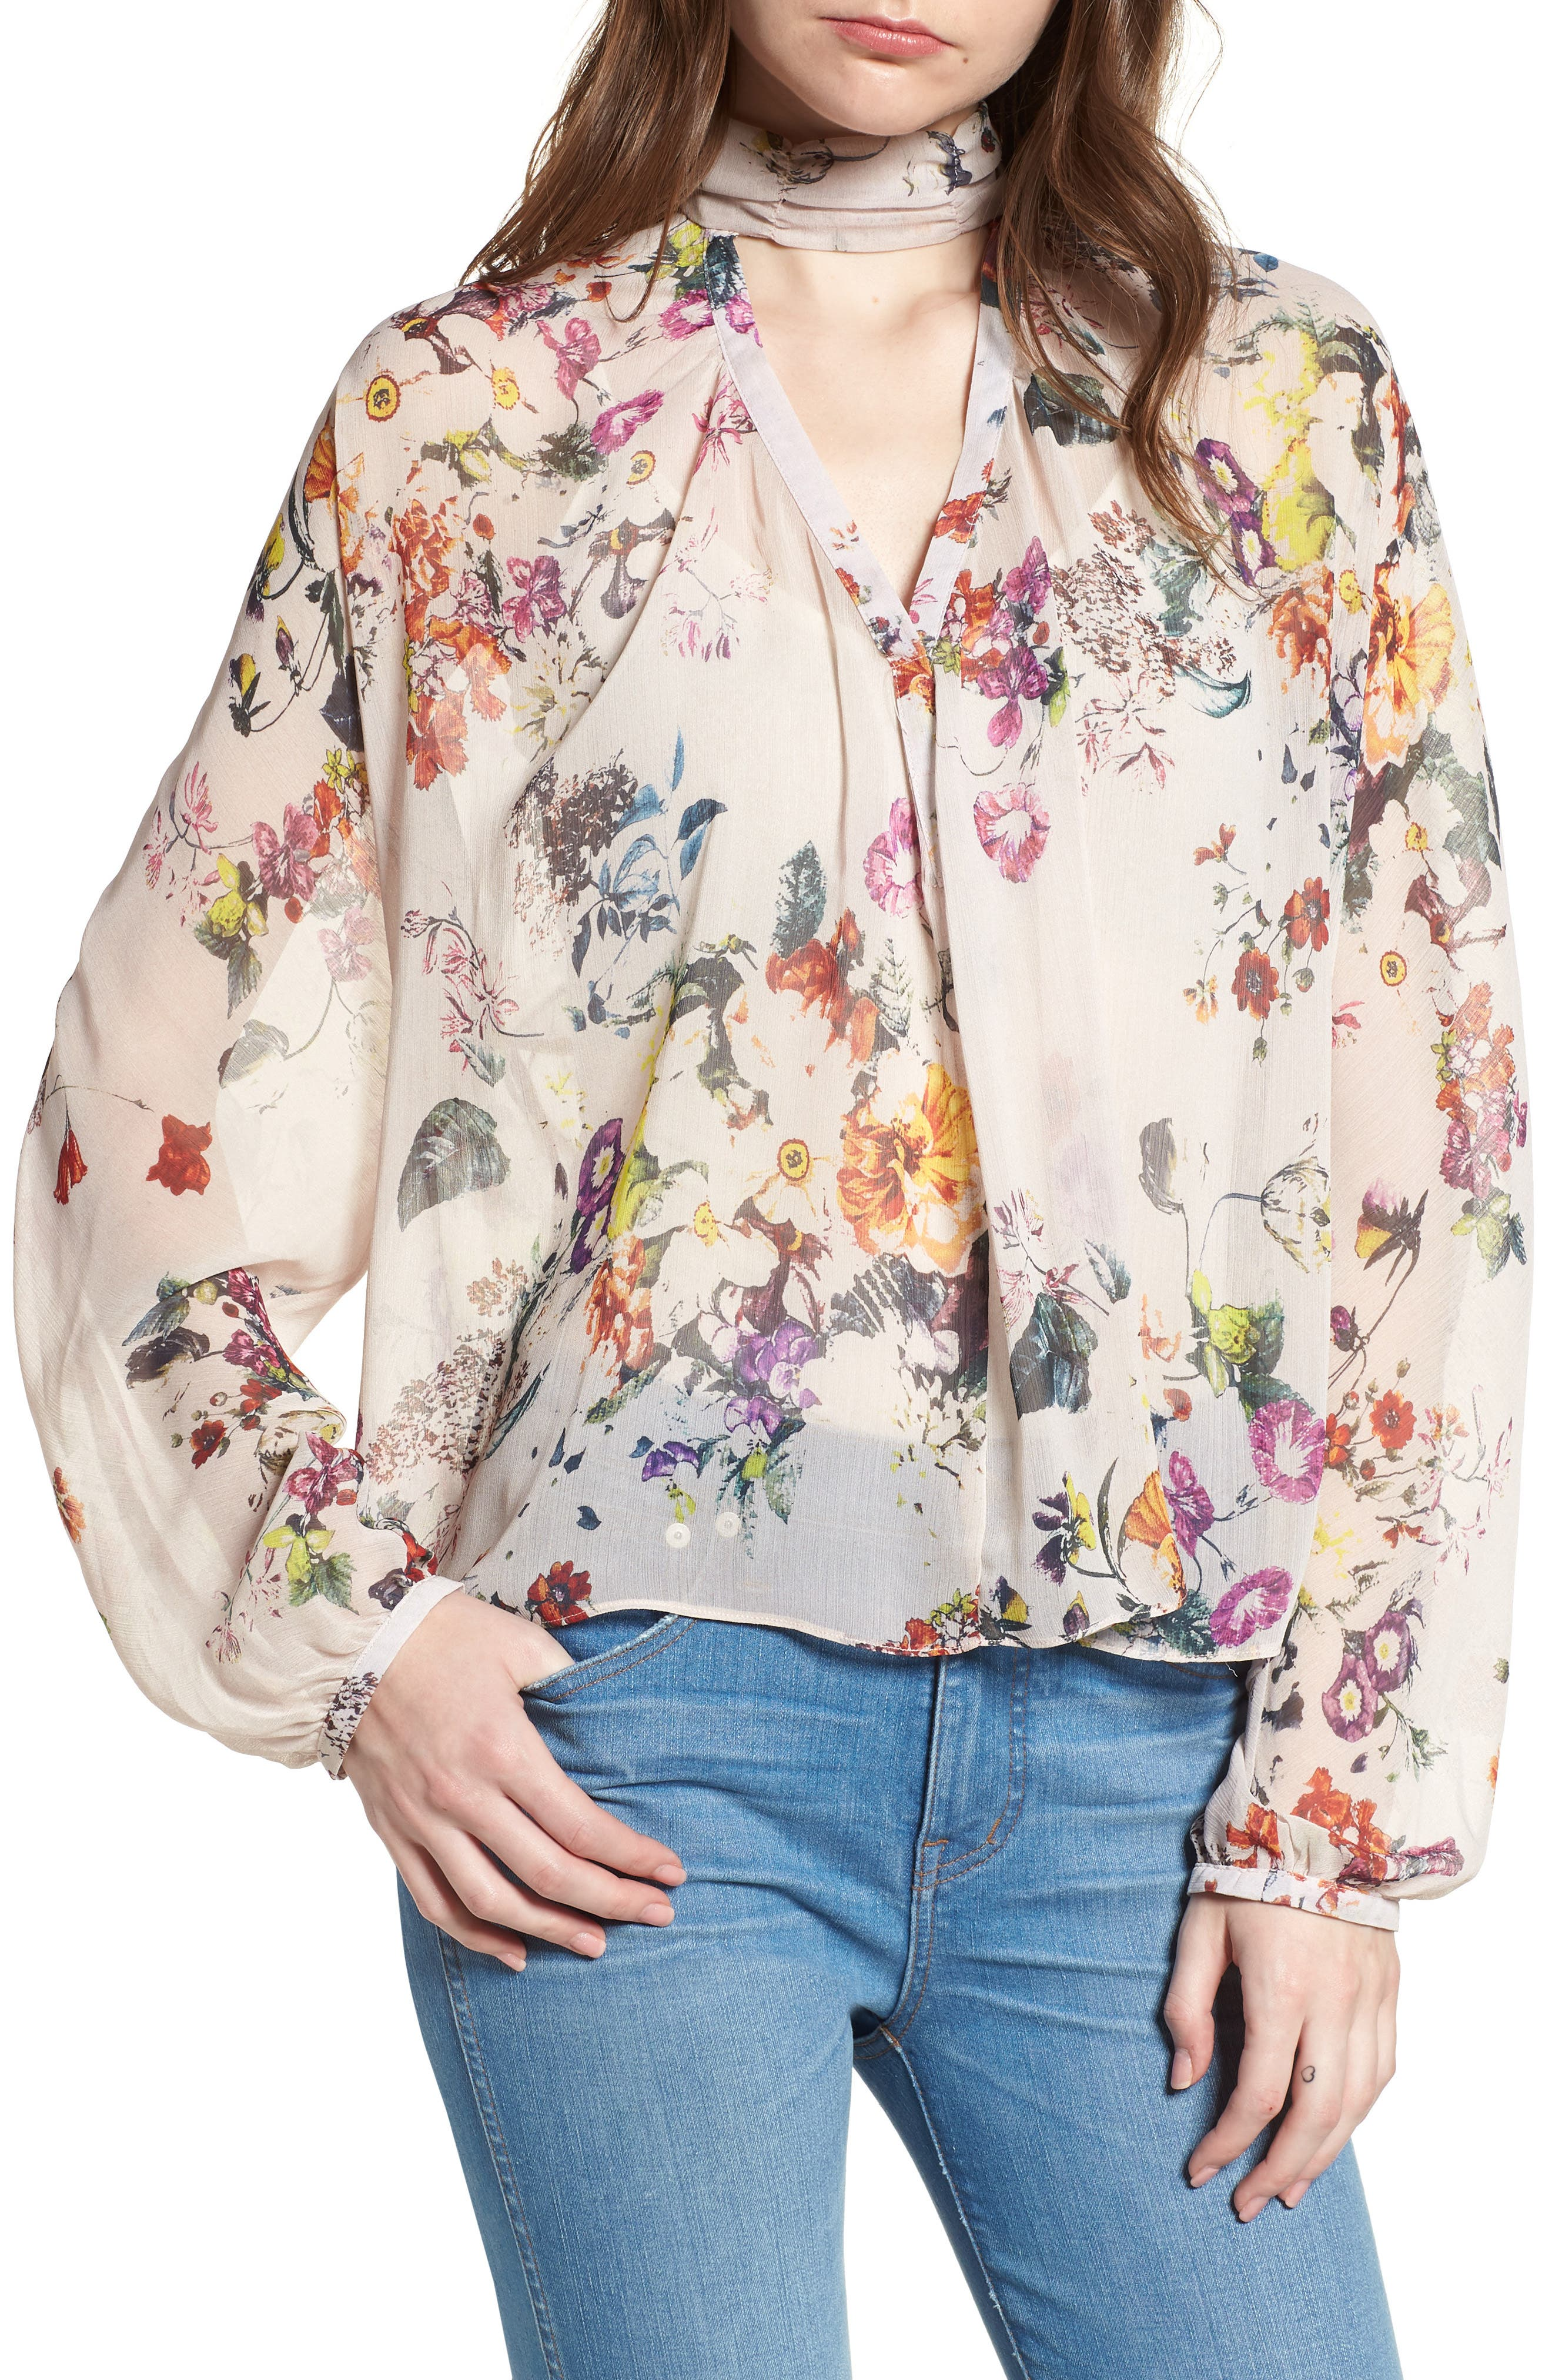 Bishop + Young Floral Choker Blouse,                             Main thumbnail 1, color,                             ROMANCE PRINT